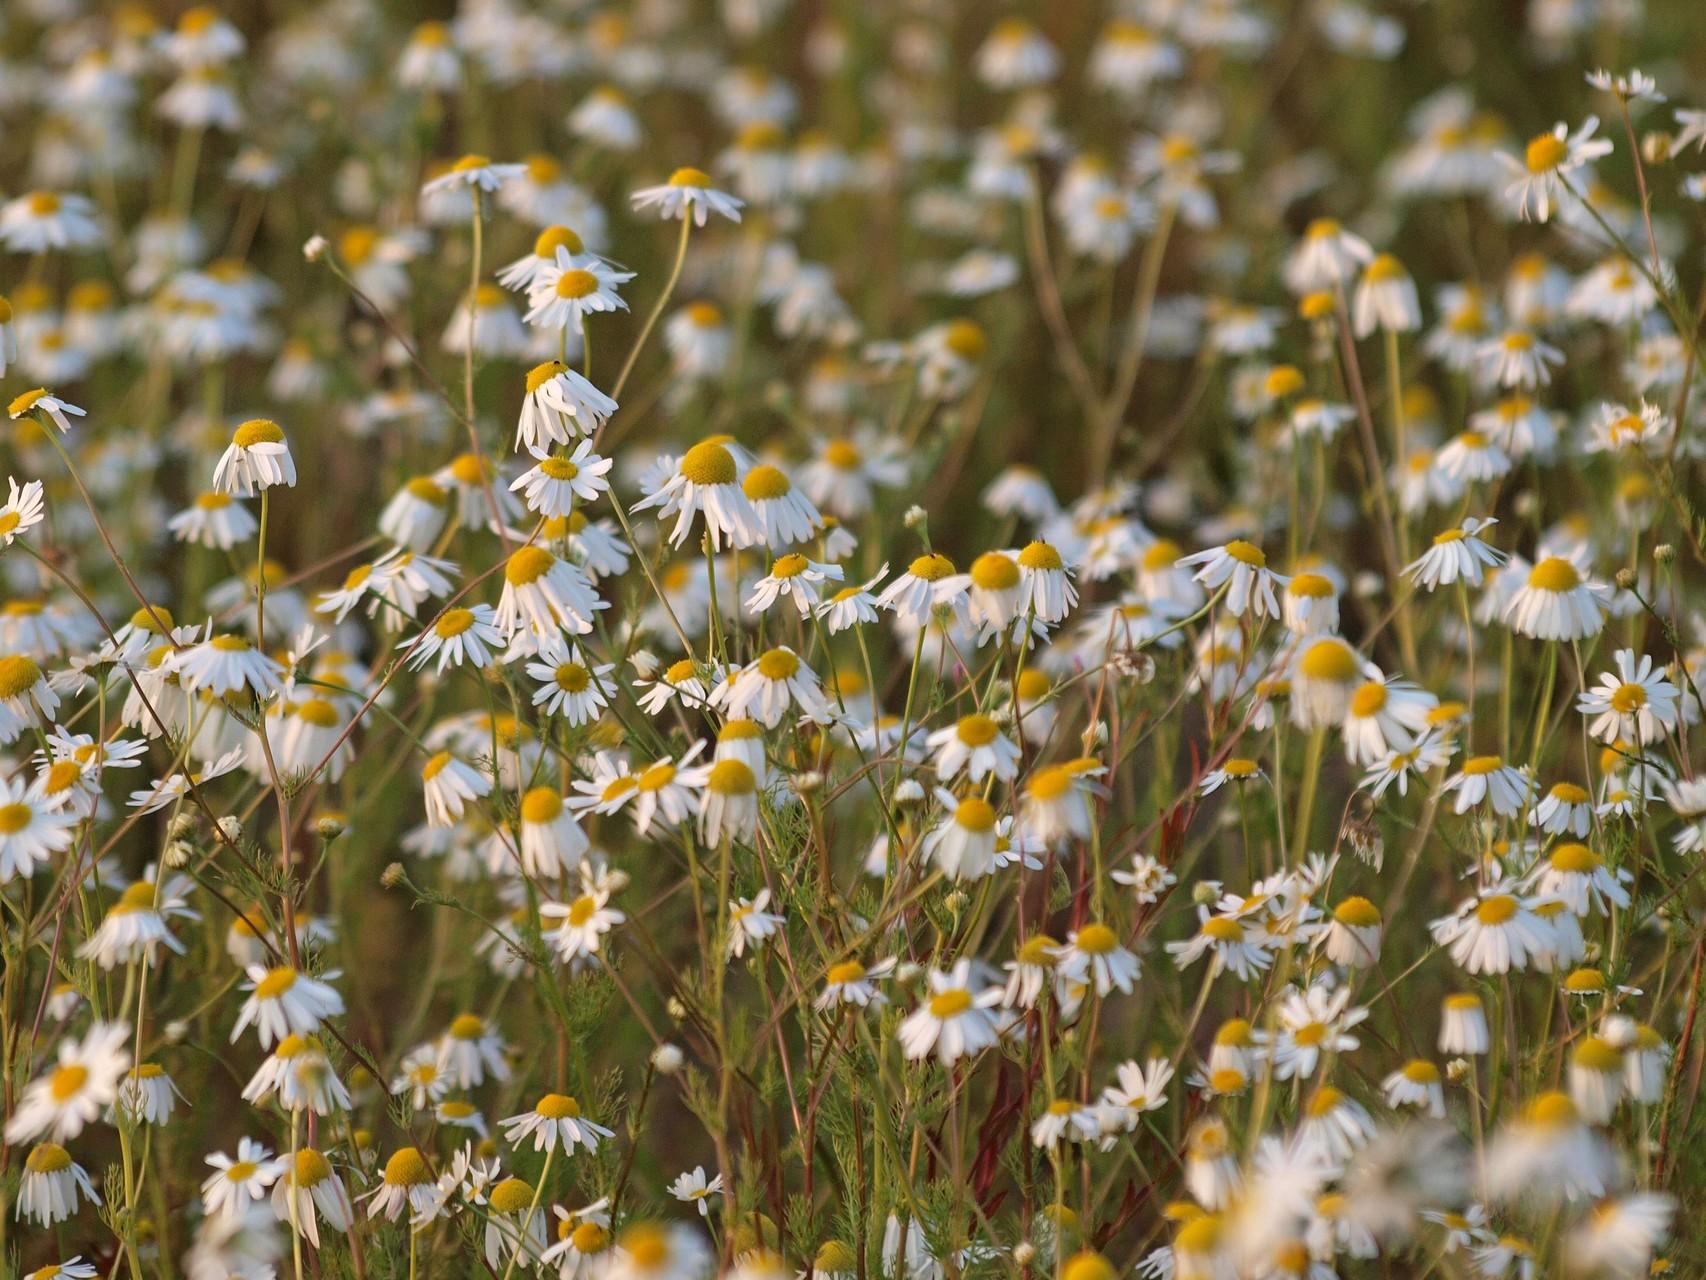 Kamillenblüten. - Foto: Kathy Büscher